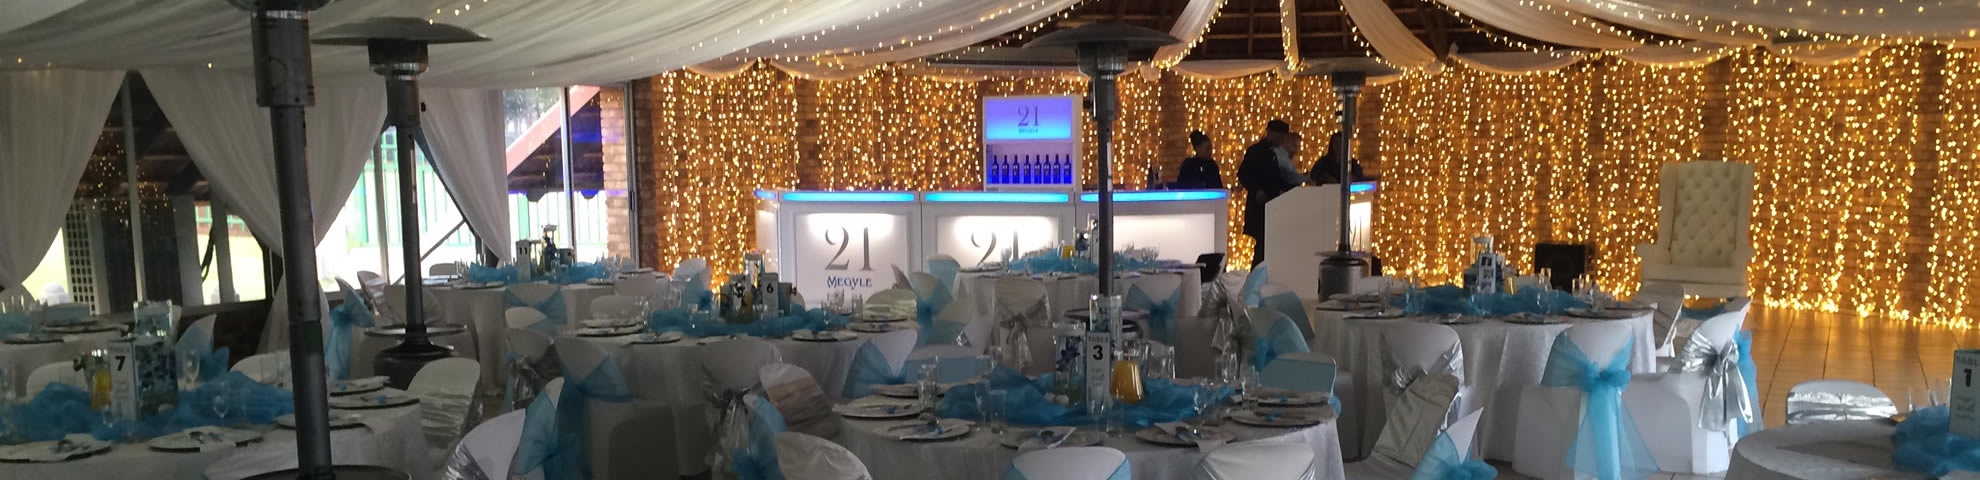 Drake Events best mobile bar service provider in Gauteng.